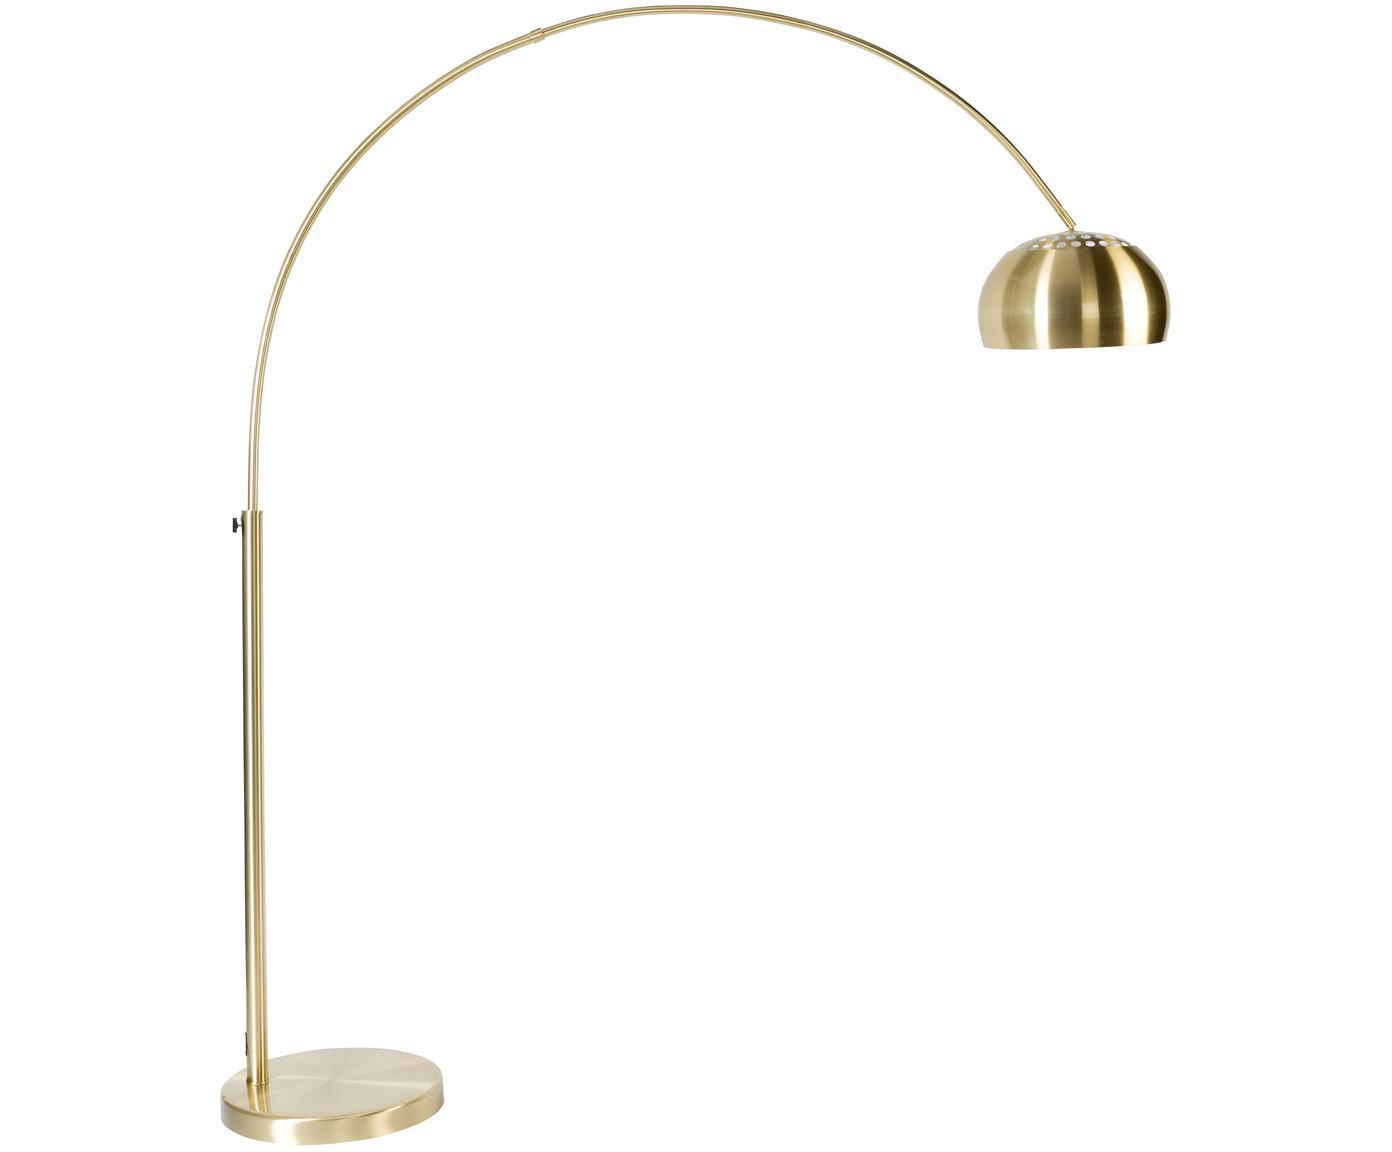 Bogenlampe Metal Bow, höhenverstellbar, Messingfarben, 170 x 205 cm